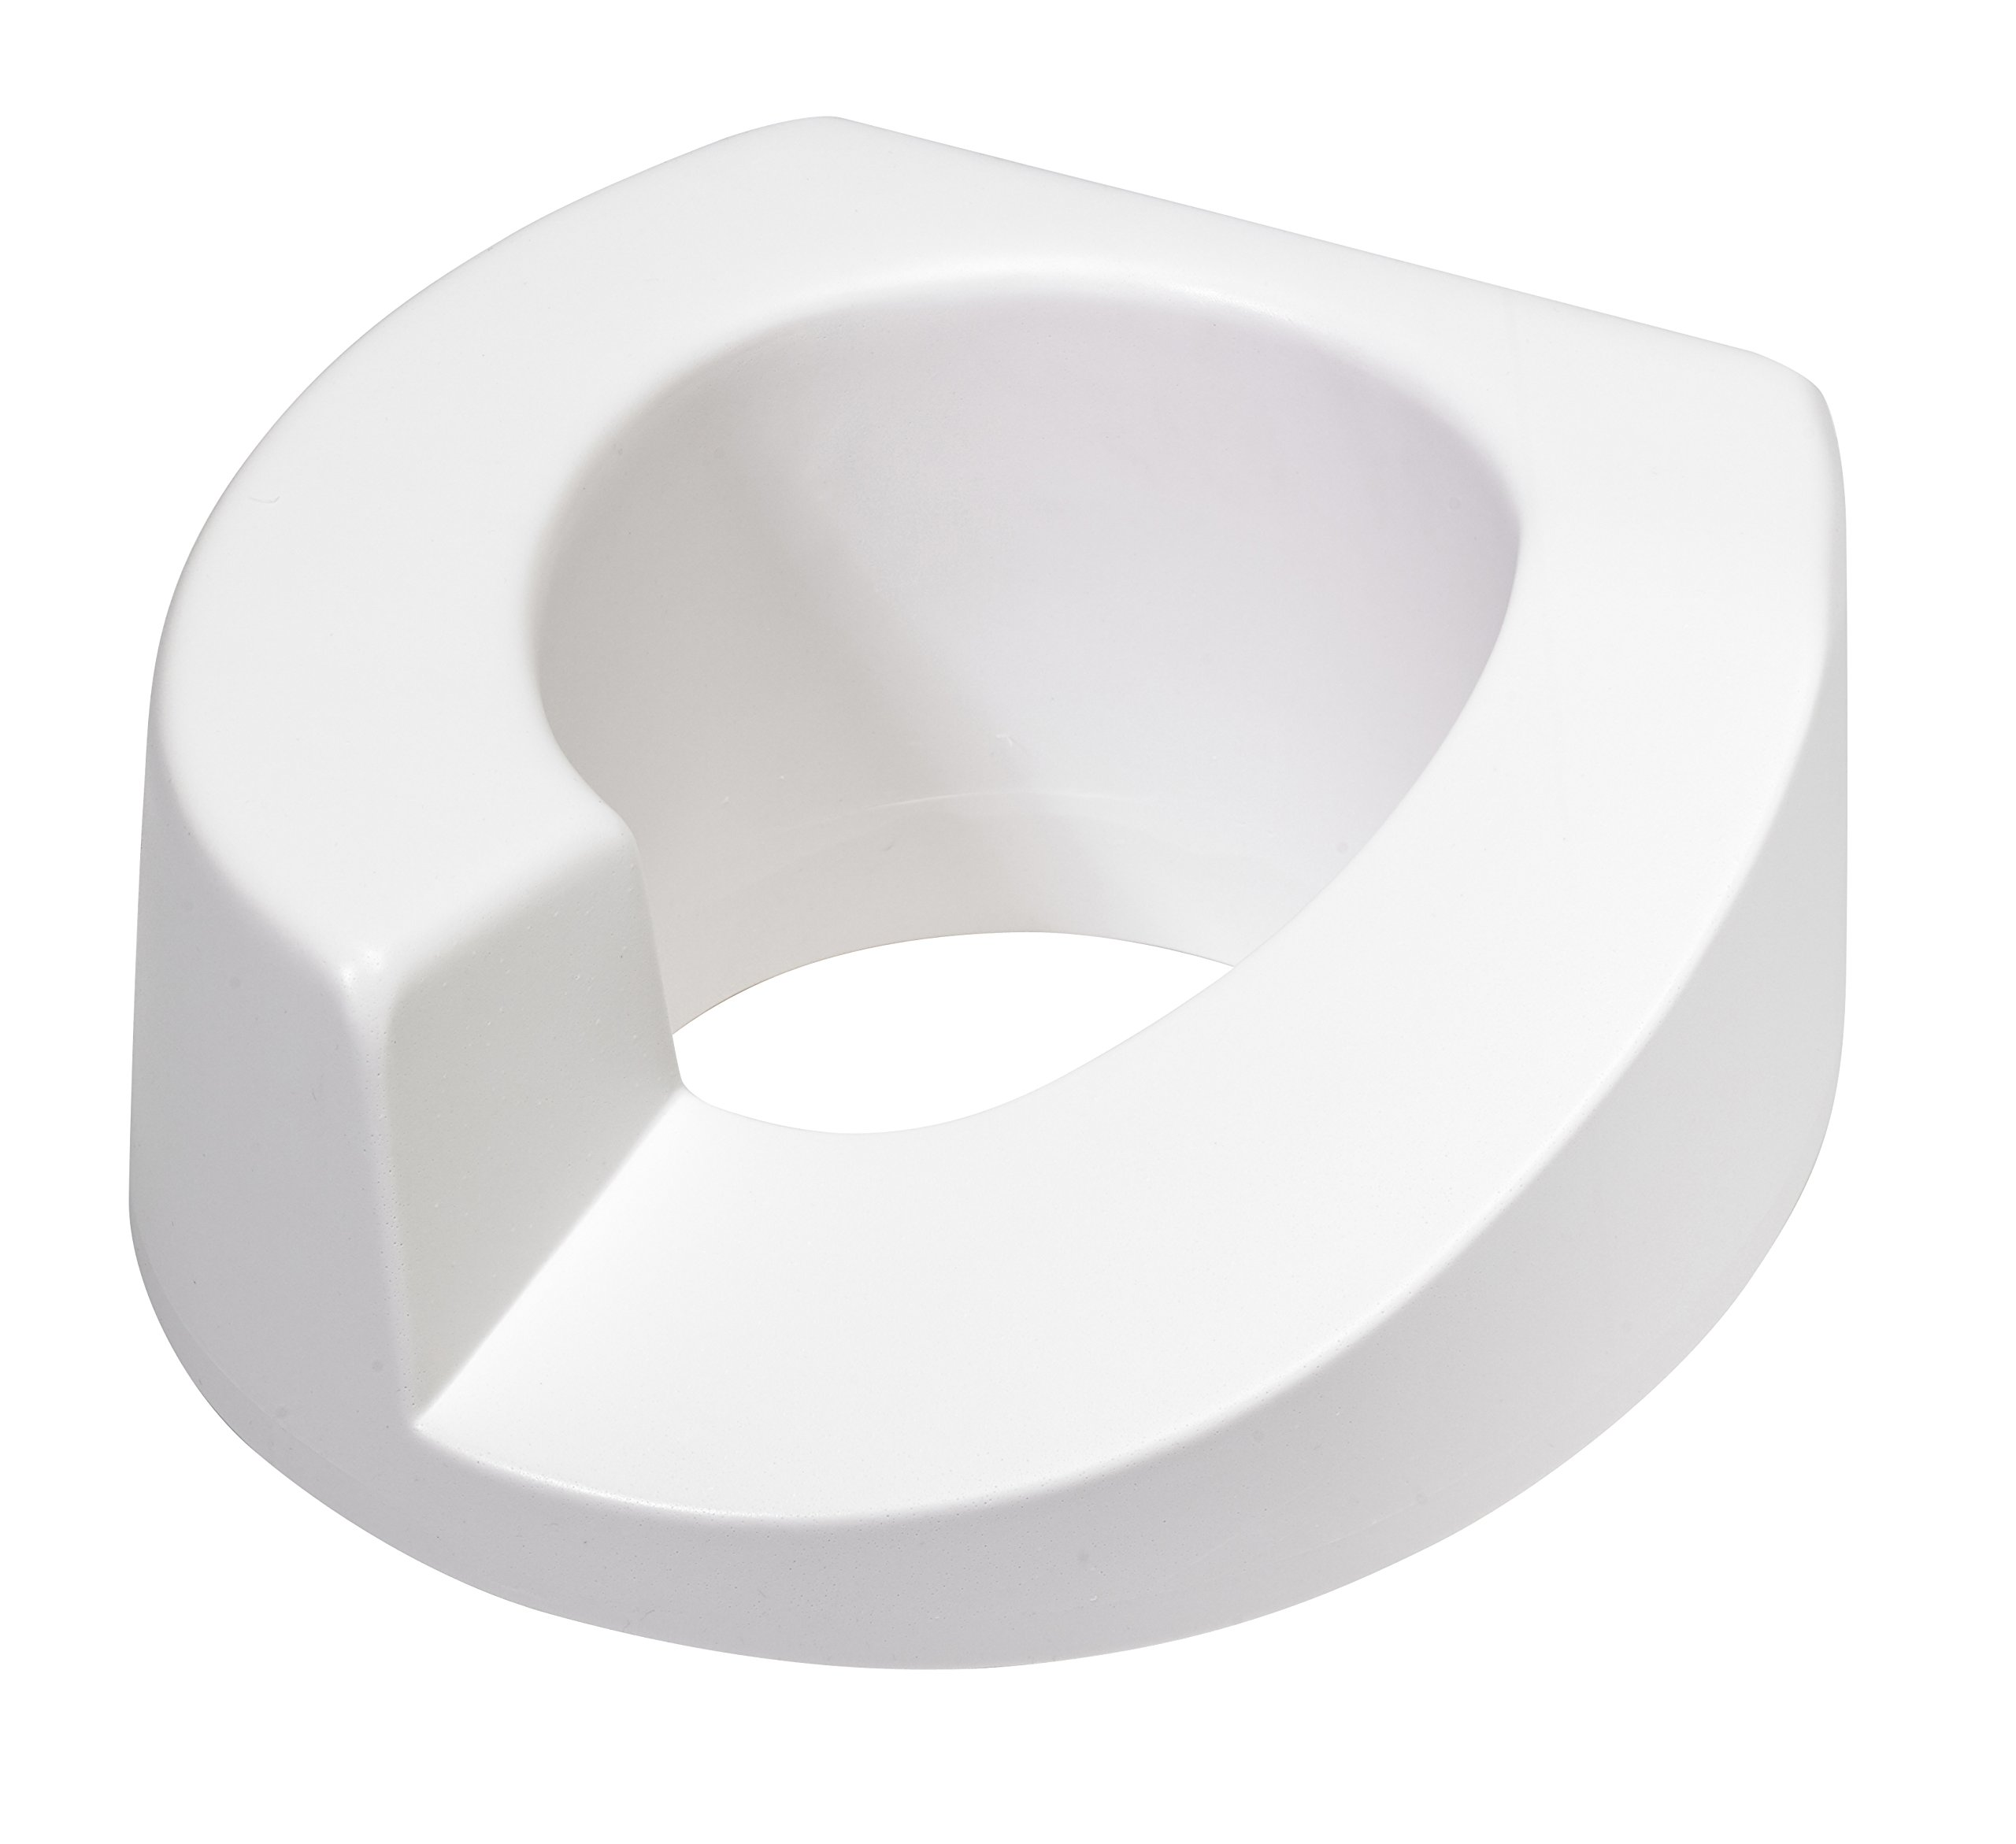 Ableware 725901000 Arthro, Tall-ette, Left Standard Elevated Toilet Seat